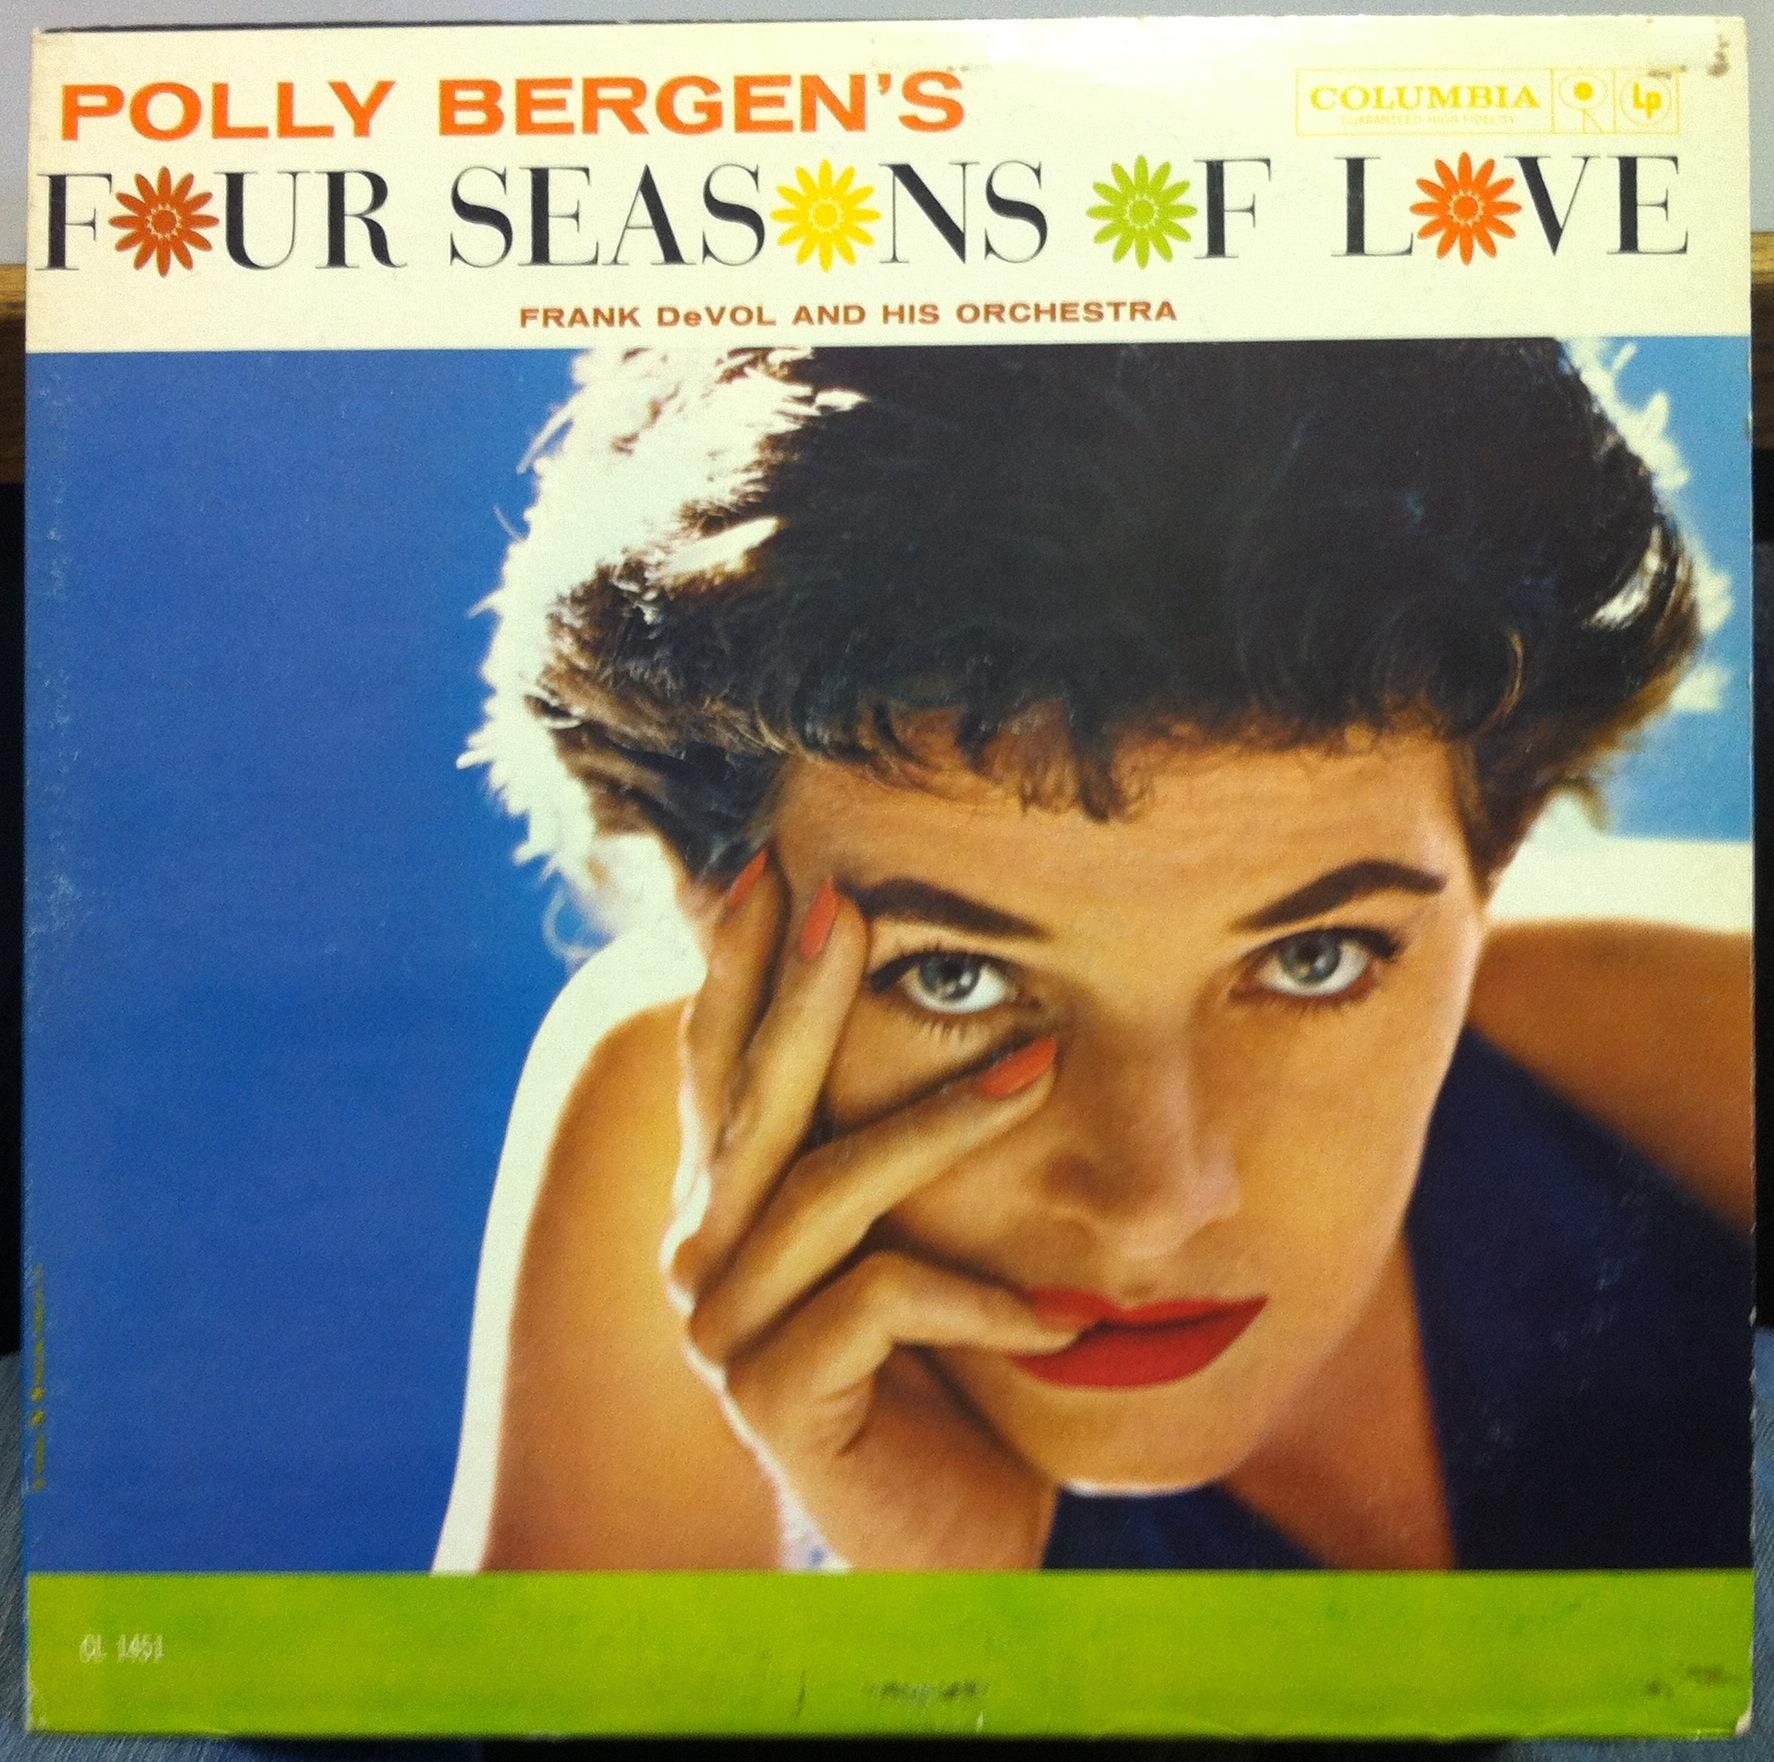 POLLY BERGEN - Polly Bergen Four Seasons Of Love Lp Vg+ Cl 1451 Record 1960 1b/1b 6 Eye (four Seasons Of Love)